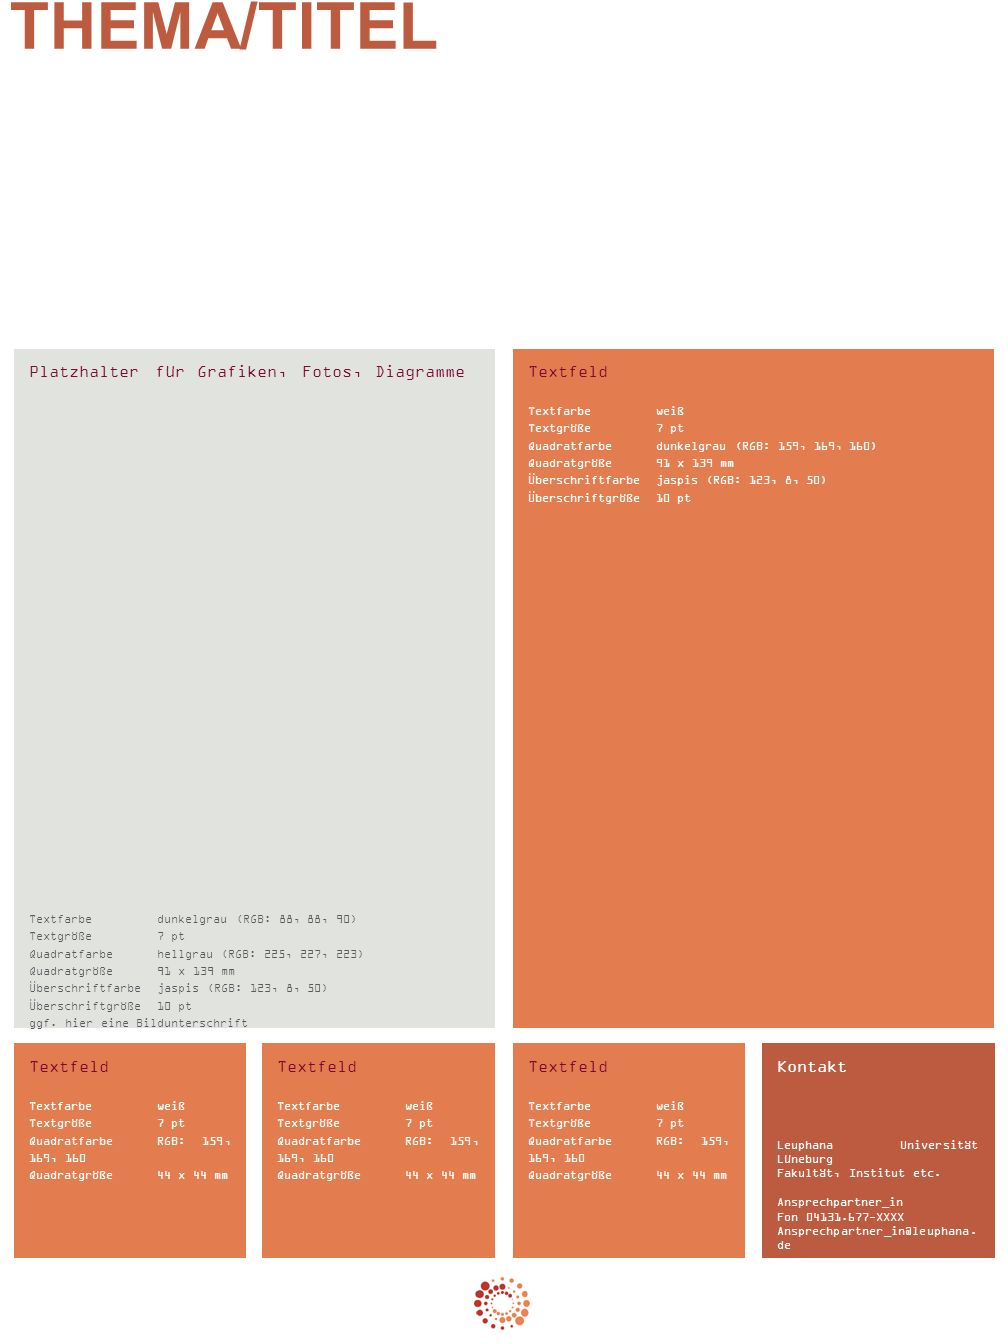 Textfeld Textfarbeweiß Textgröße 7 pt Quadratfarbedunkelgrau (RGB: 159, 169, 160) Quadratgröße91 x 139 mm Überschriftfarbejaspis (RGB: 123, 8, 50) Überschriftgröße10 pt Platzhalter für Grafiken, Fotos, Diagramme Textfarbedunkelgrau (RGB: 88, 88, 90) Textgröße 7 pt Quadratfarbehellgrau (RGB: 225, 227, 223) Quadratgröße91 x 139 mm Überschriftfarbejaspis (RGB: 123, 8, 50) Überschriftgröße10 pt ggf.